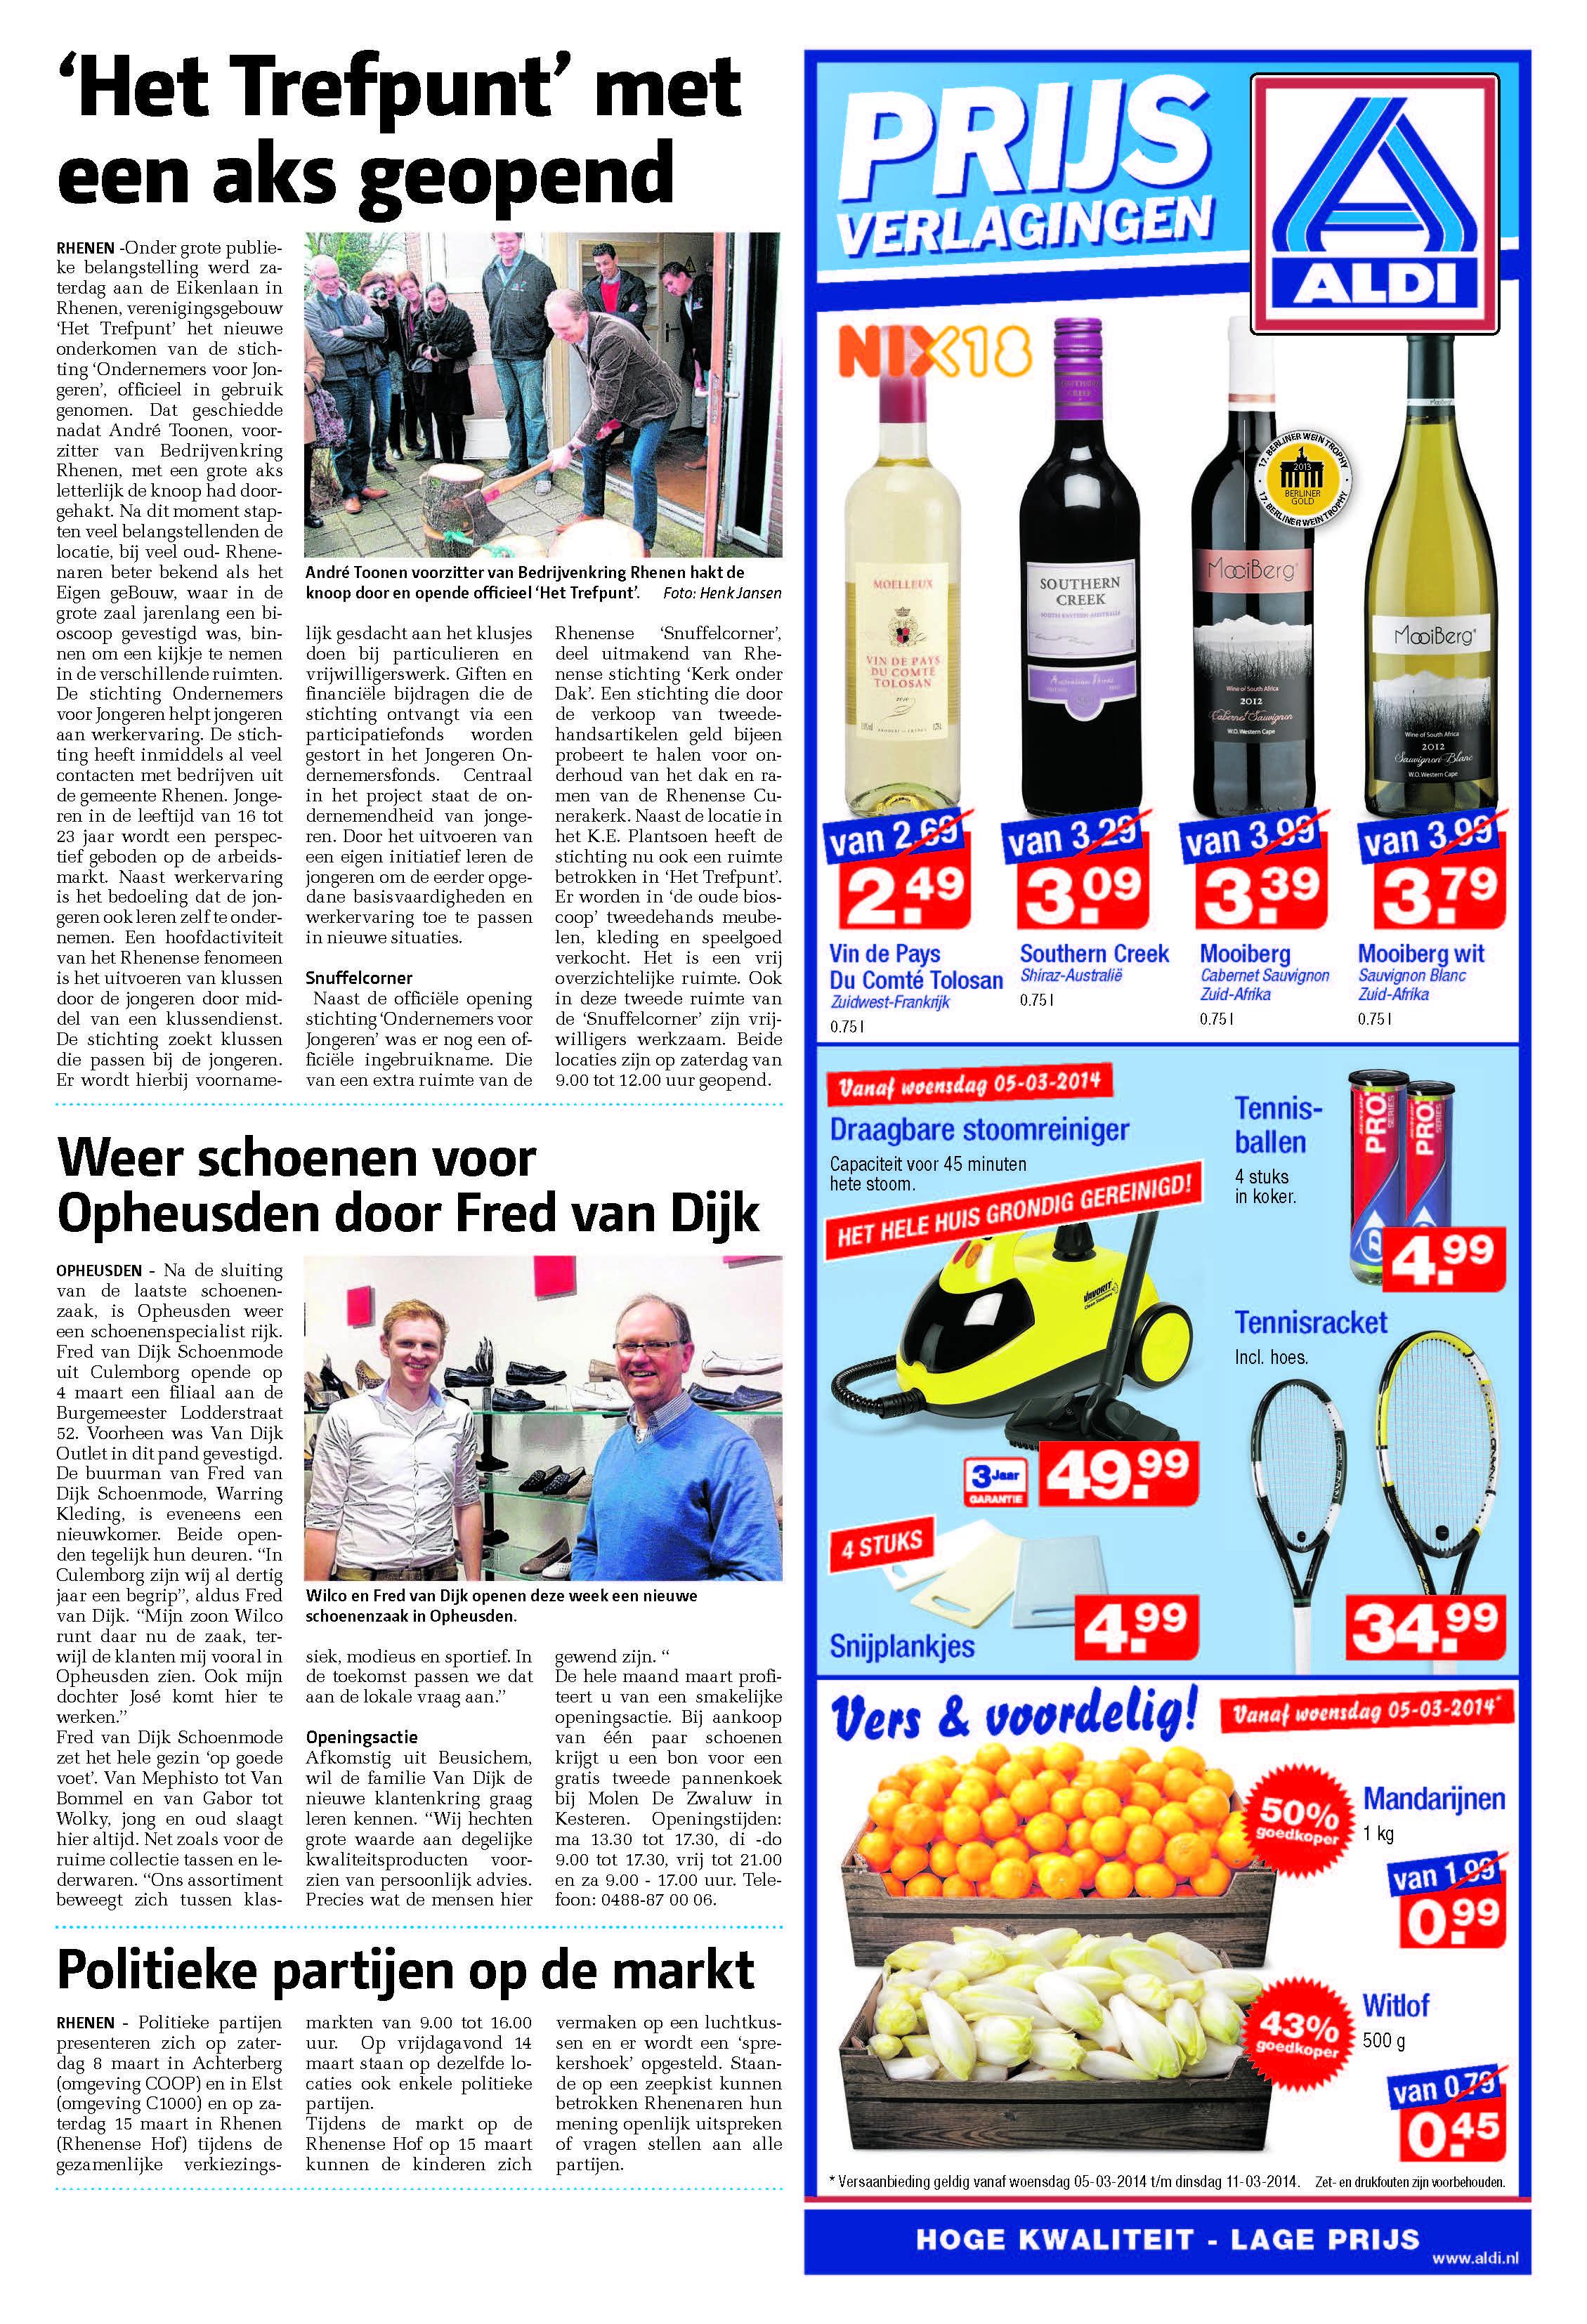 Rhenense Betuwse Courant 5 maart 2014